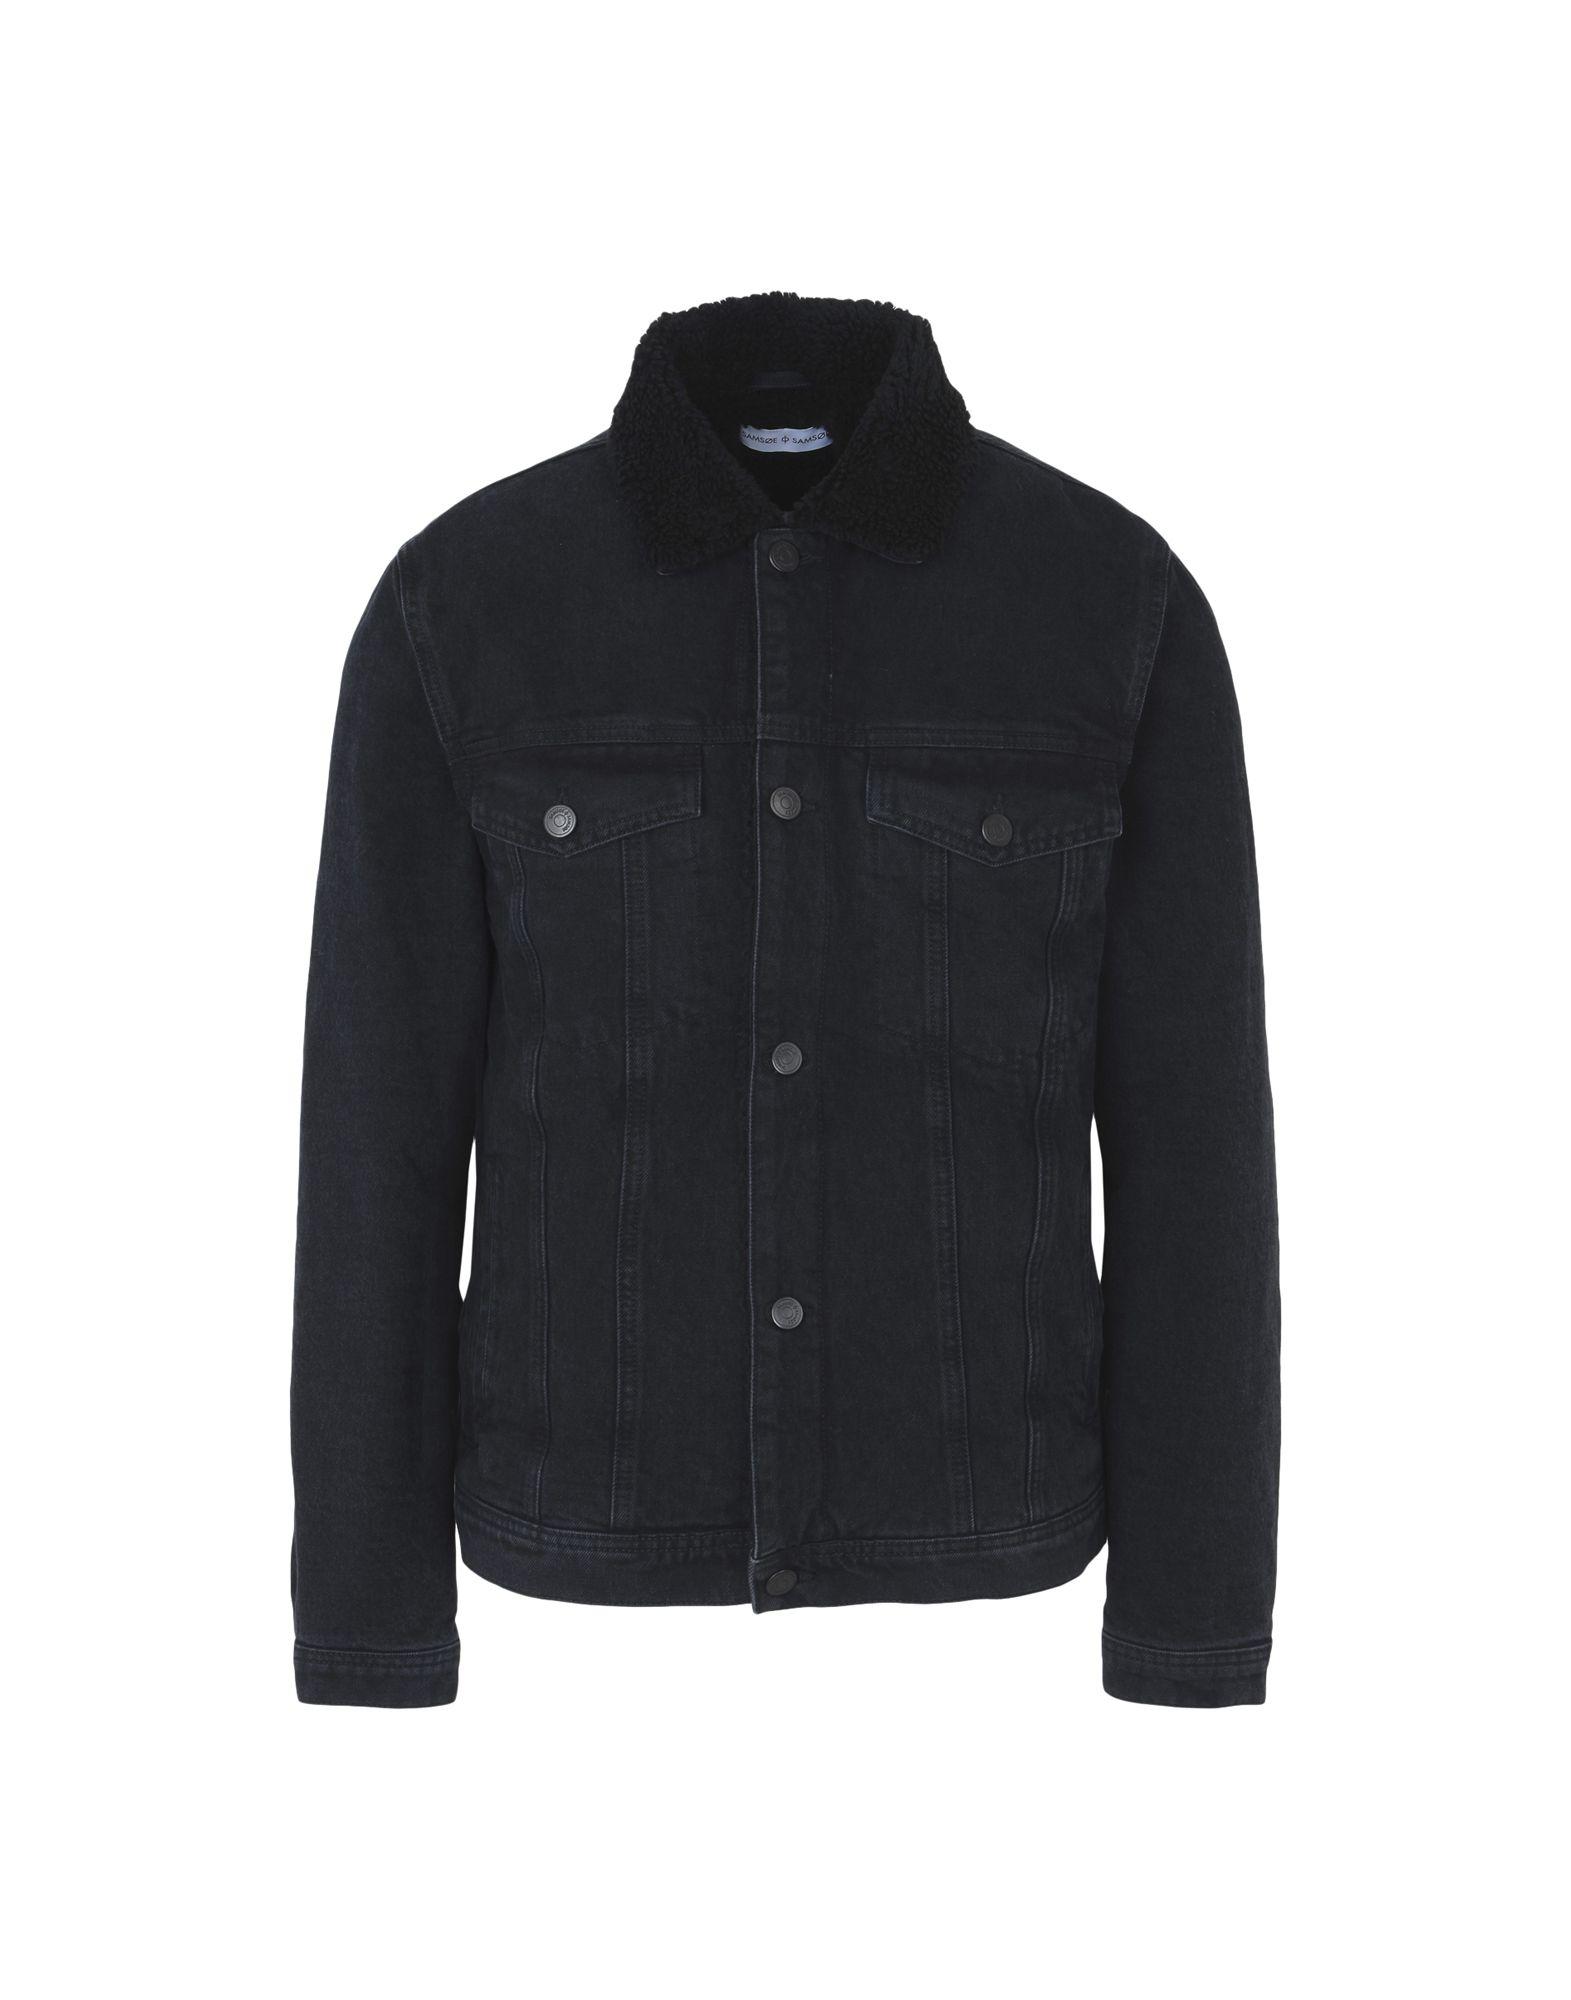 Giubbotto Jeans Samsøe Φ Samsøe Laust Jacket 9340 - Uomo - Acquista online su